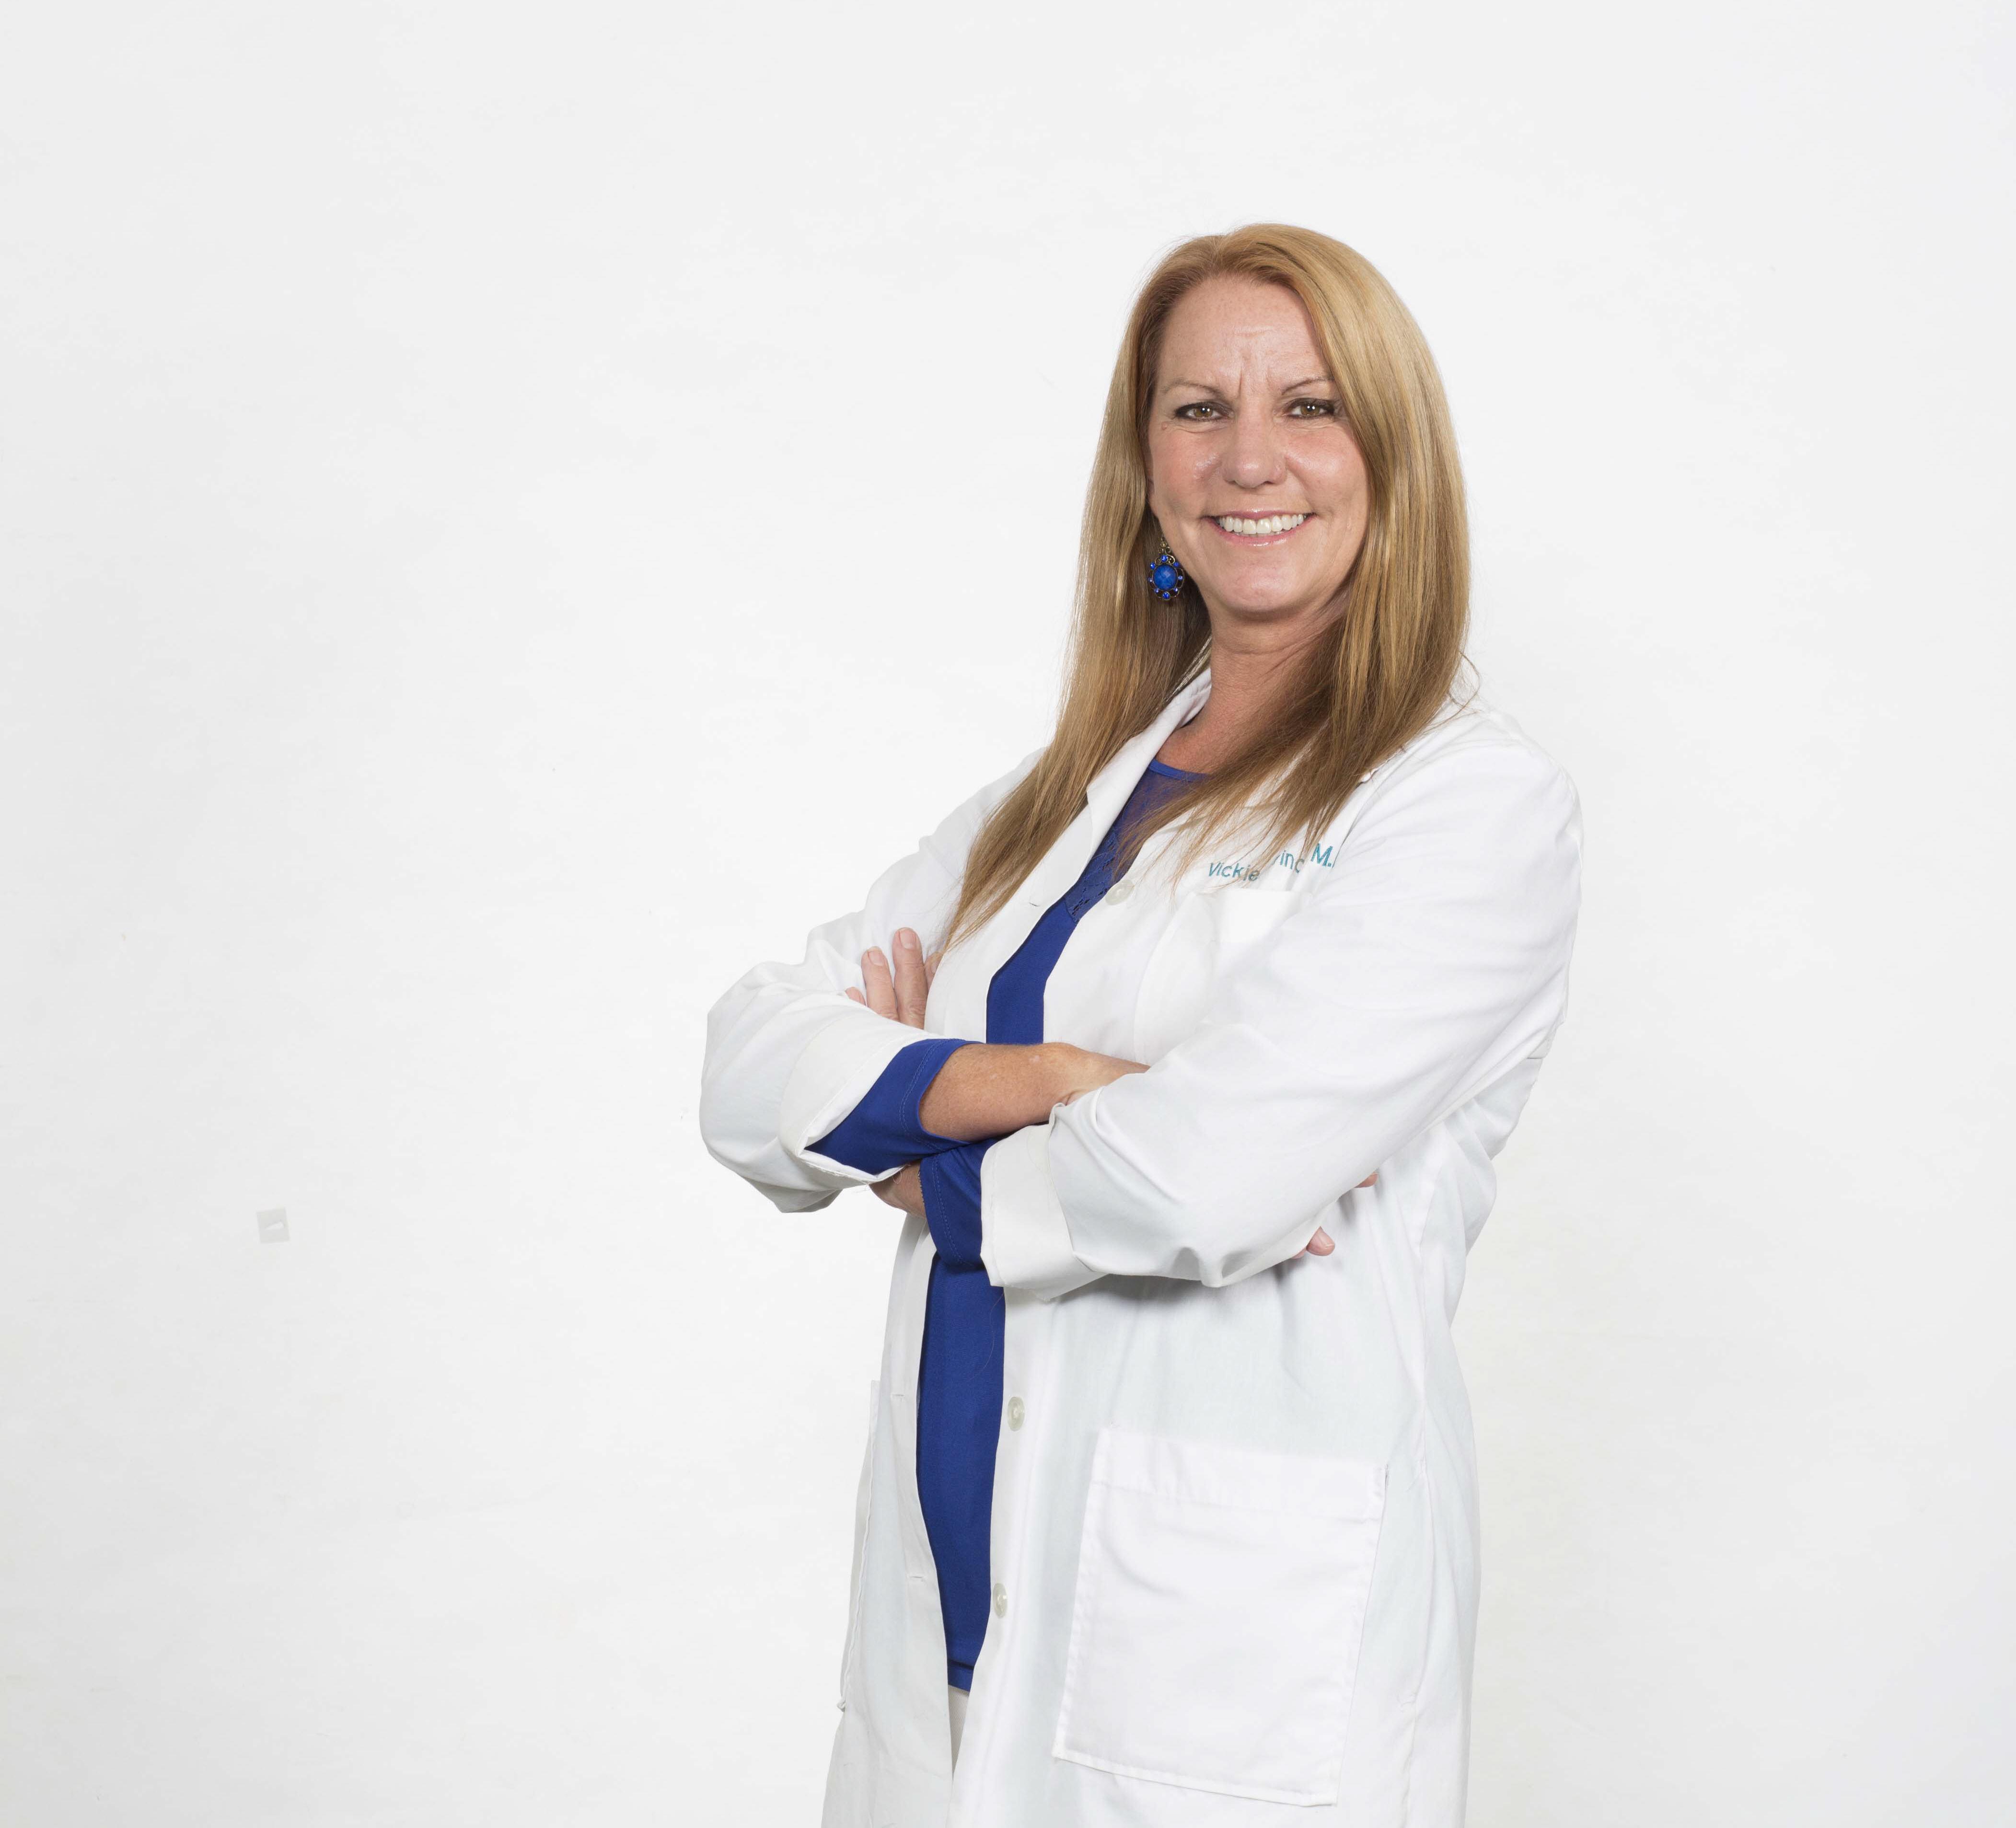 Vickie Prince, MD